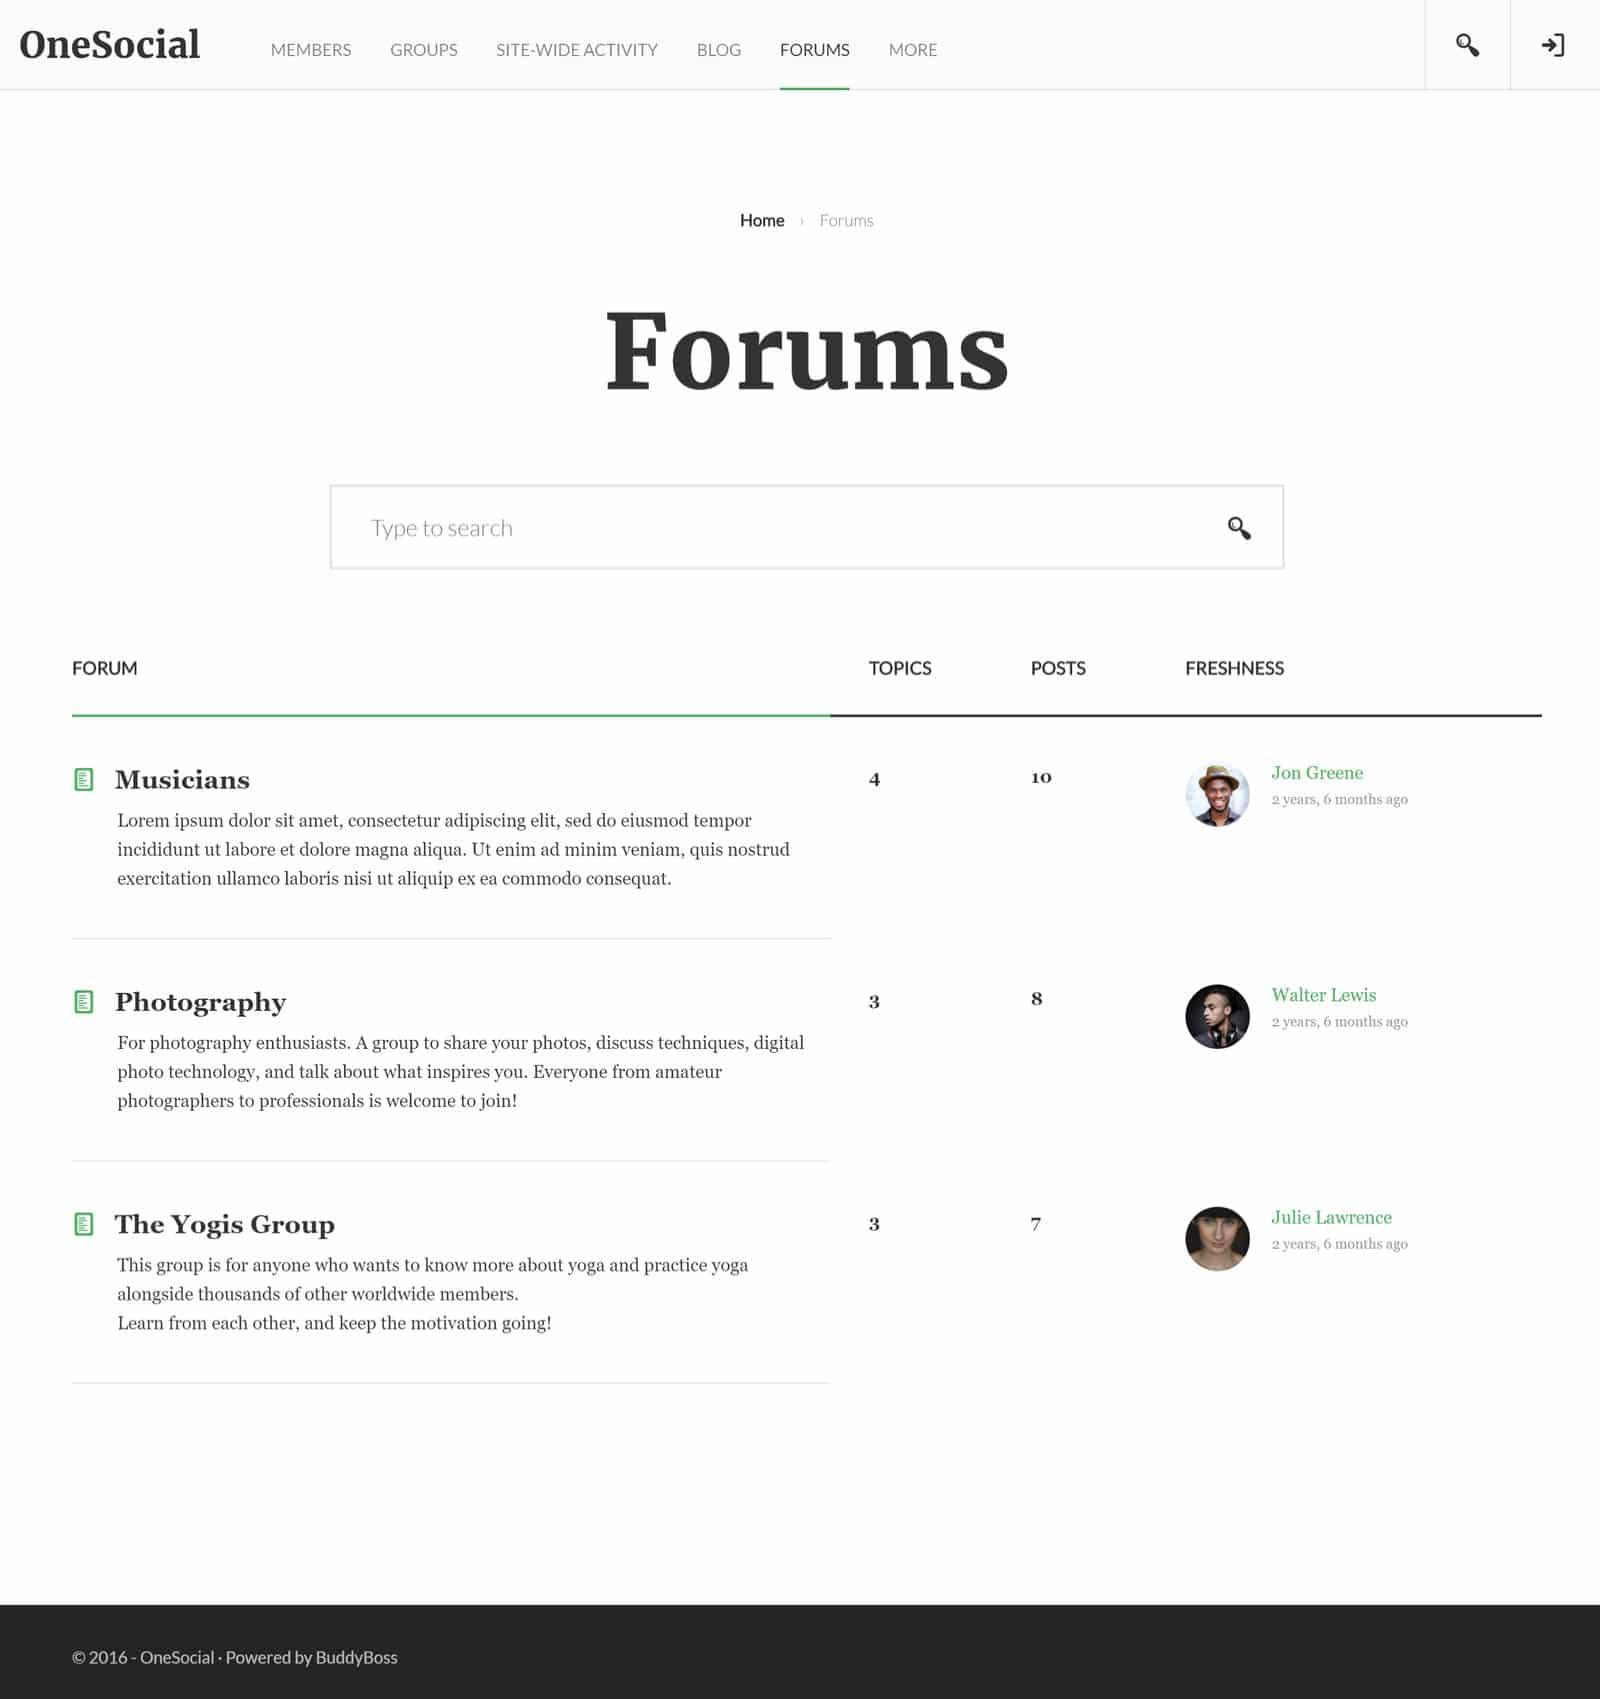 OneSocial - Website Screenshot